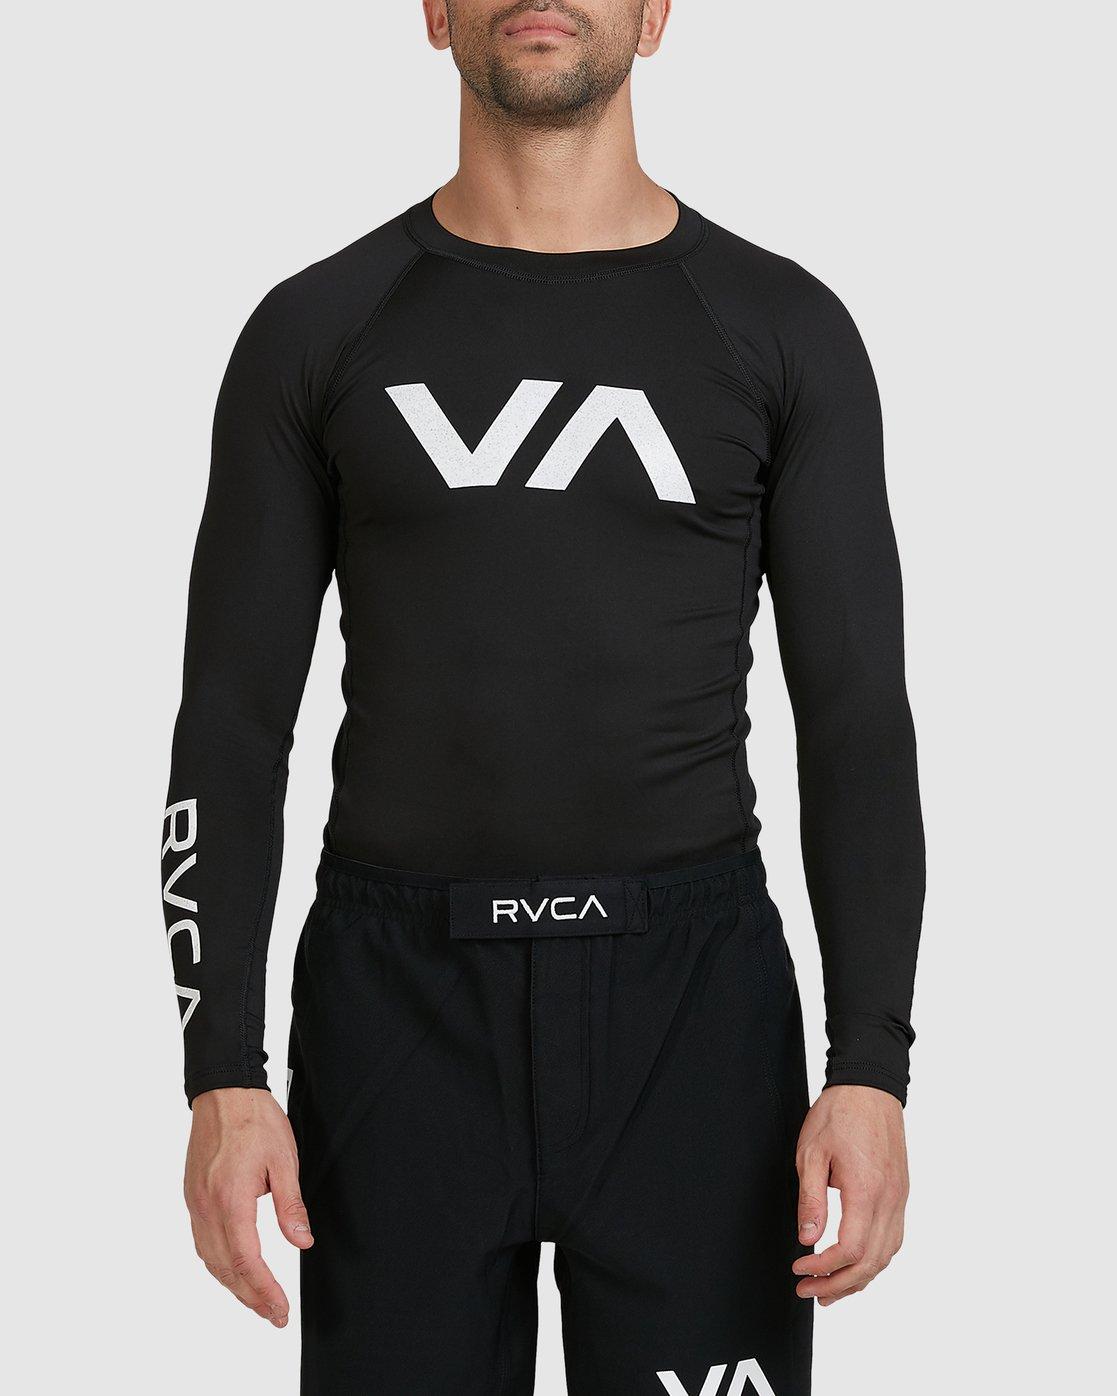 9 Sport Long Sleeve Rashguard Black R381661 RVCA